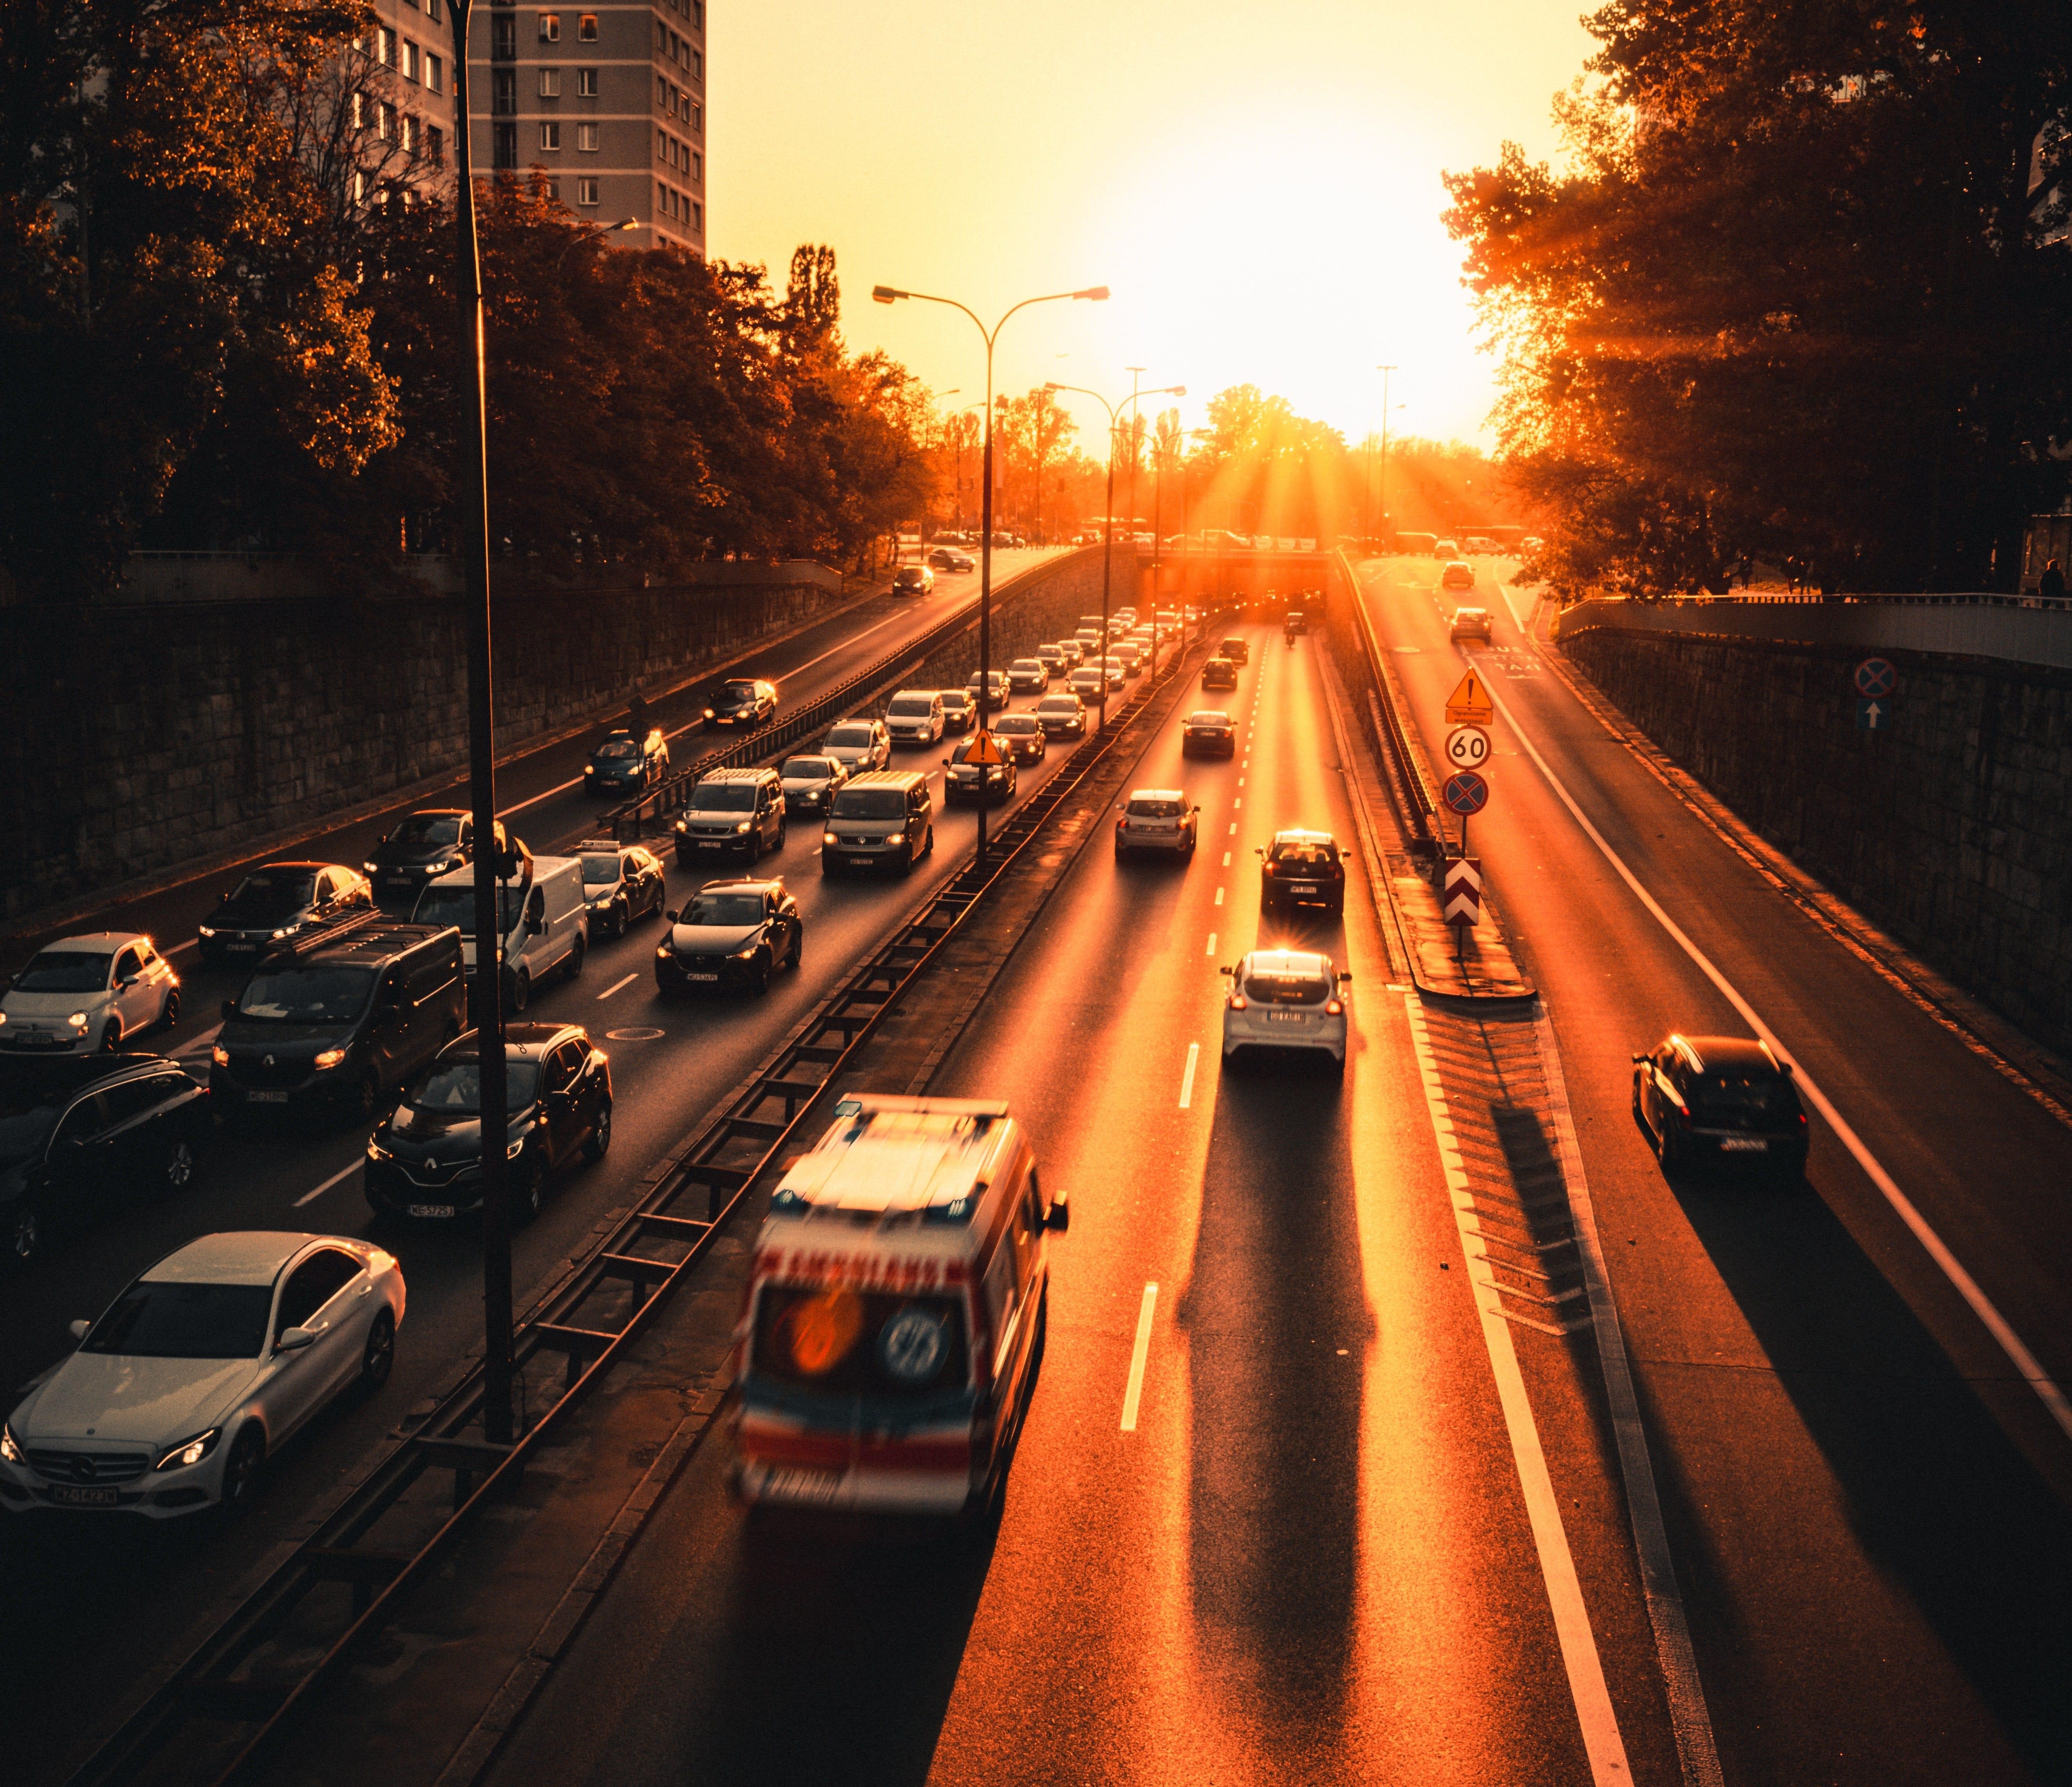 Ambulance in evening traffic